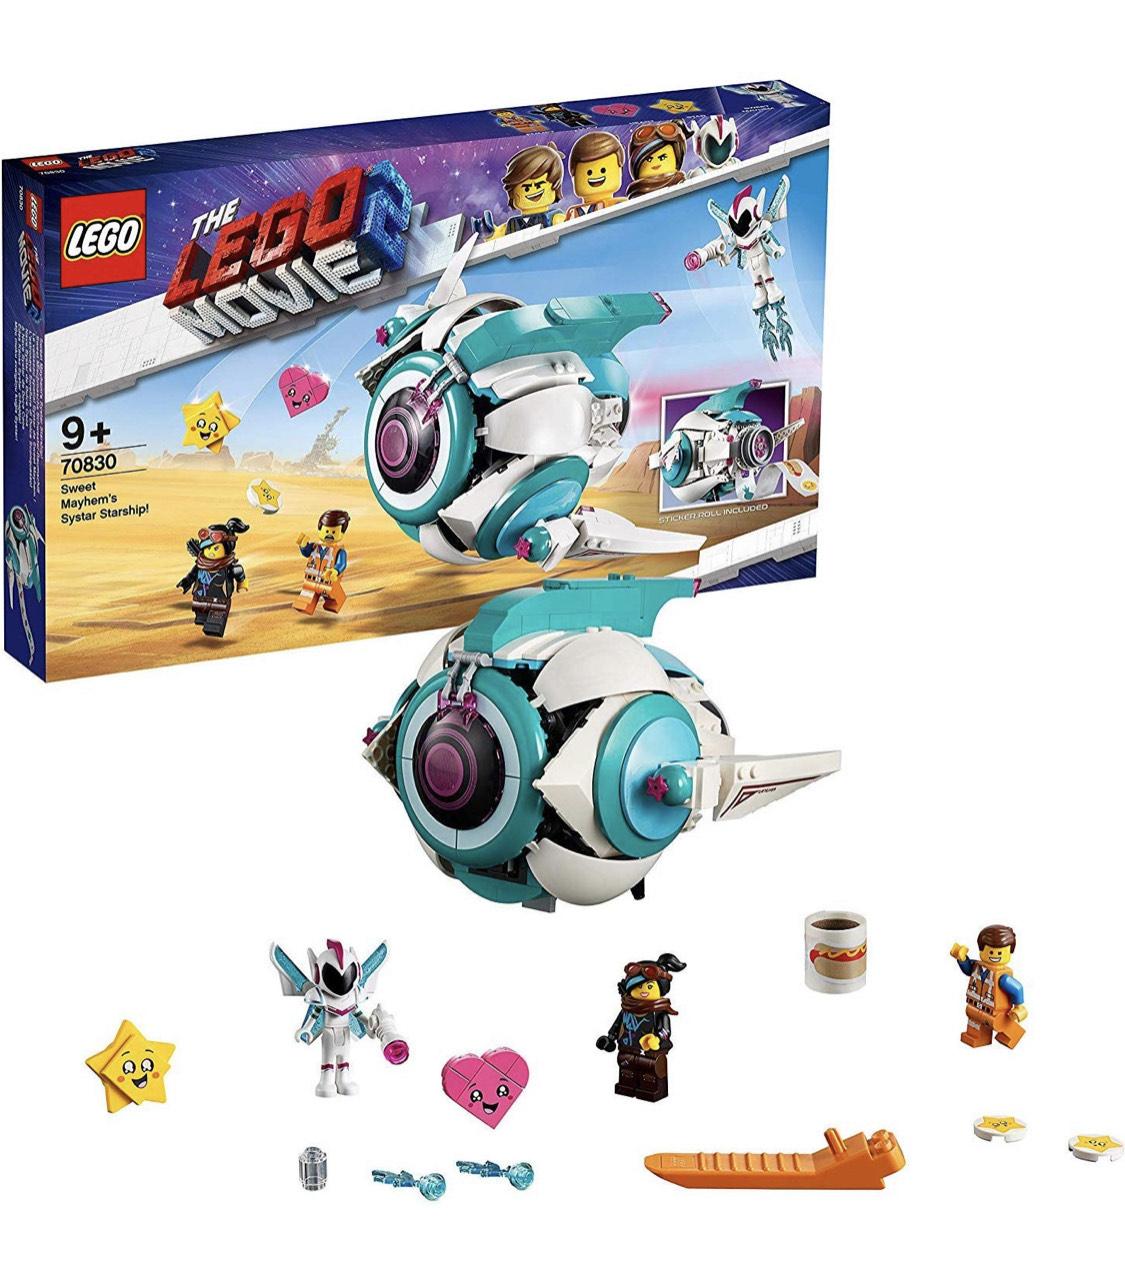 THE LEGO MOVIE 2 70830 Sweet mengmachine Systar ruimteschip